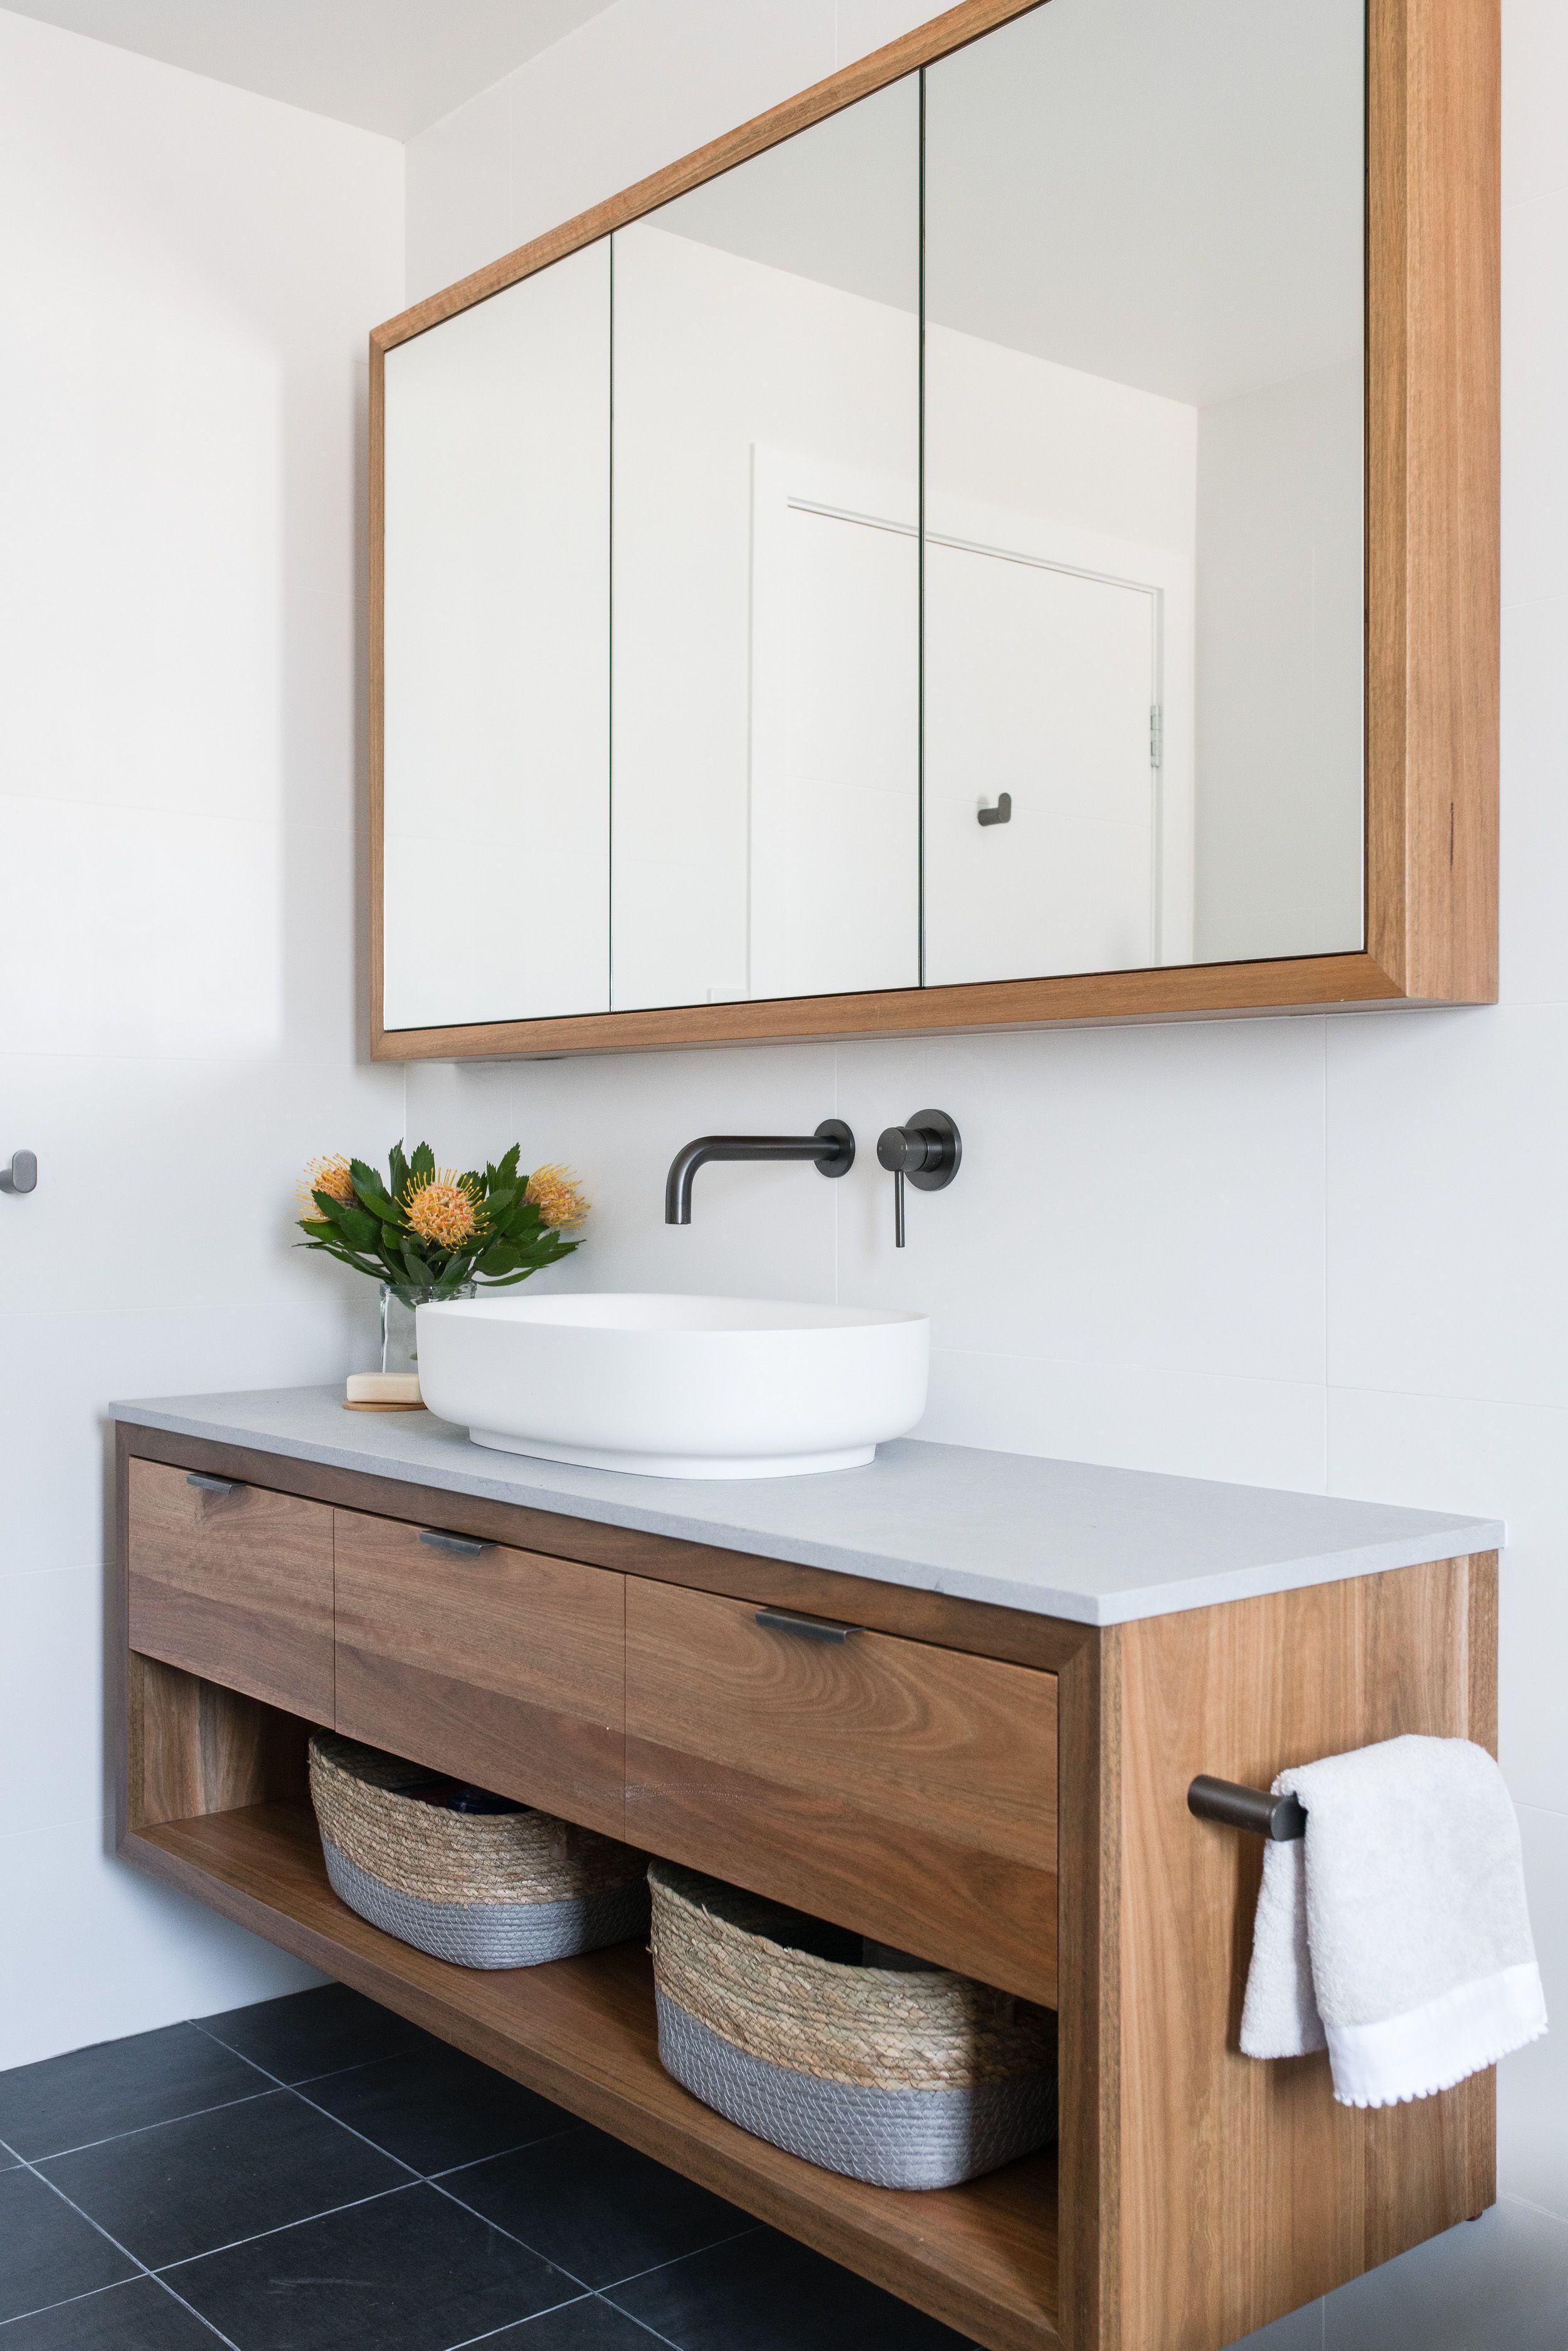 Timber Vanity And Shaving Cabinet Cabinet Shaving Timber Vanity Banyo Badezimmer Beispiele Badezimmer Neues Badezimmer